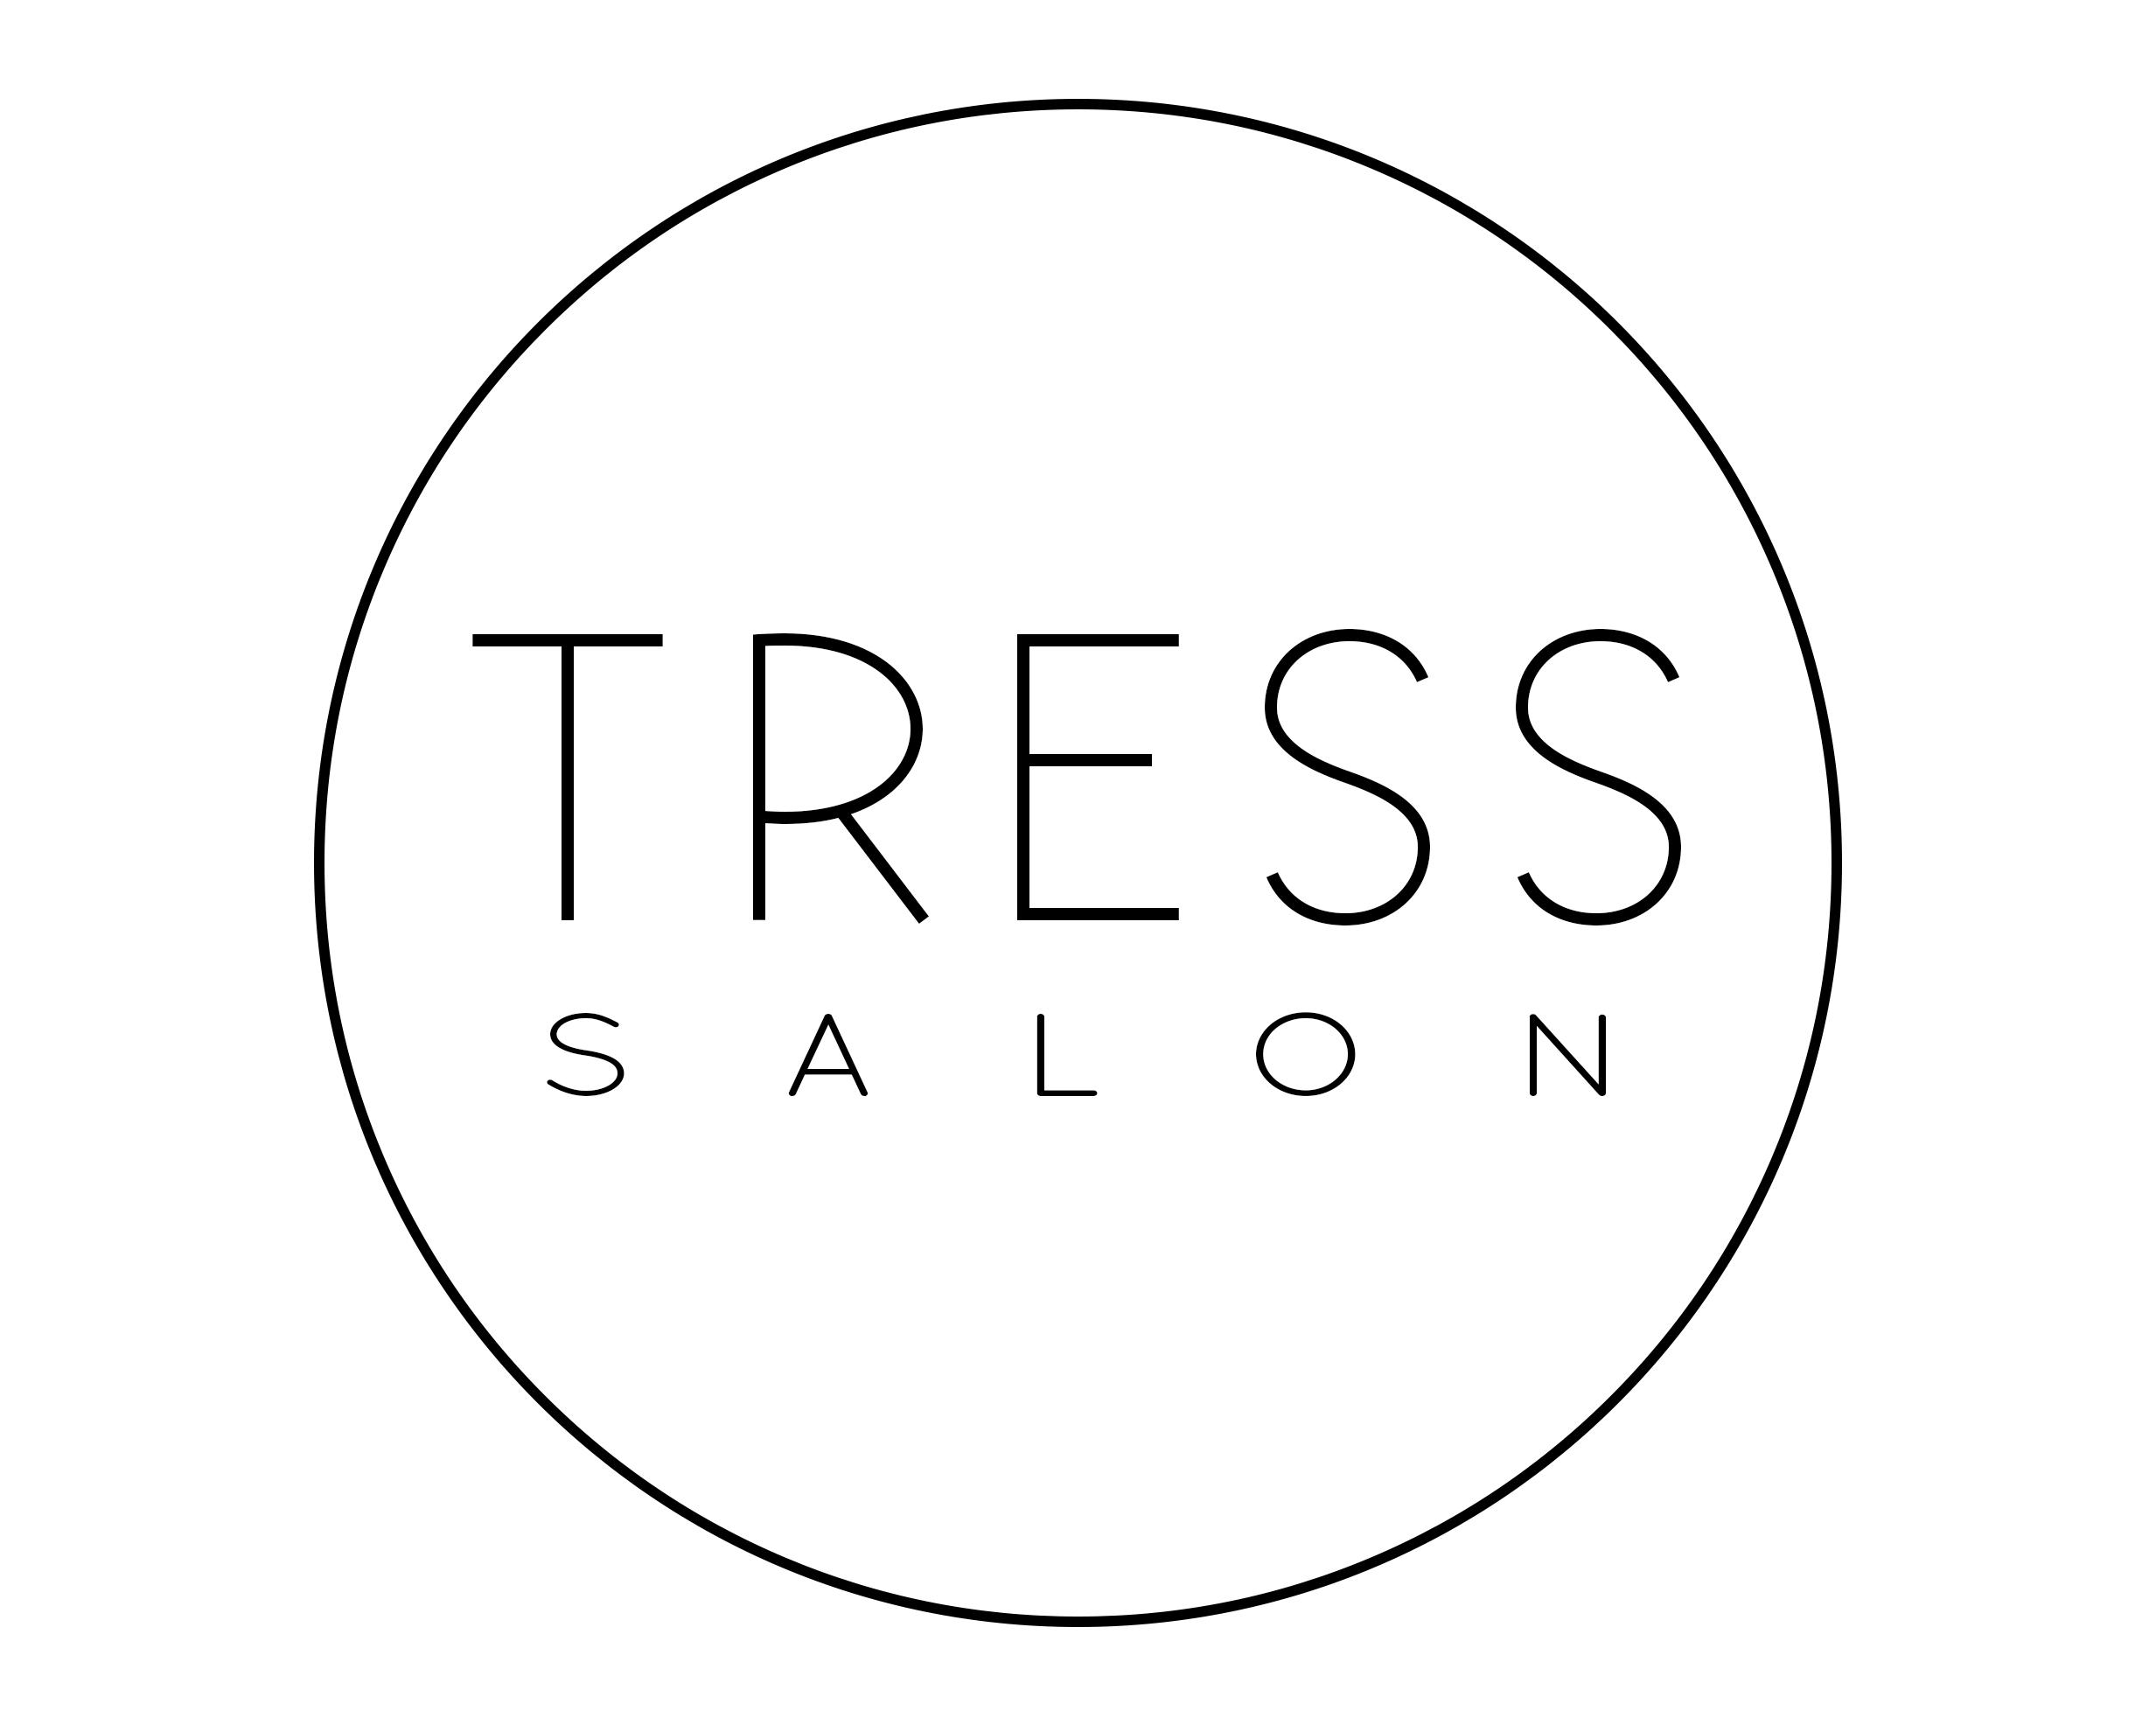 Tress Salon